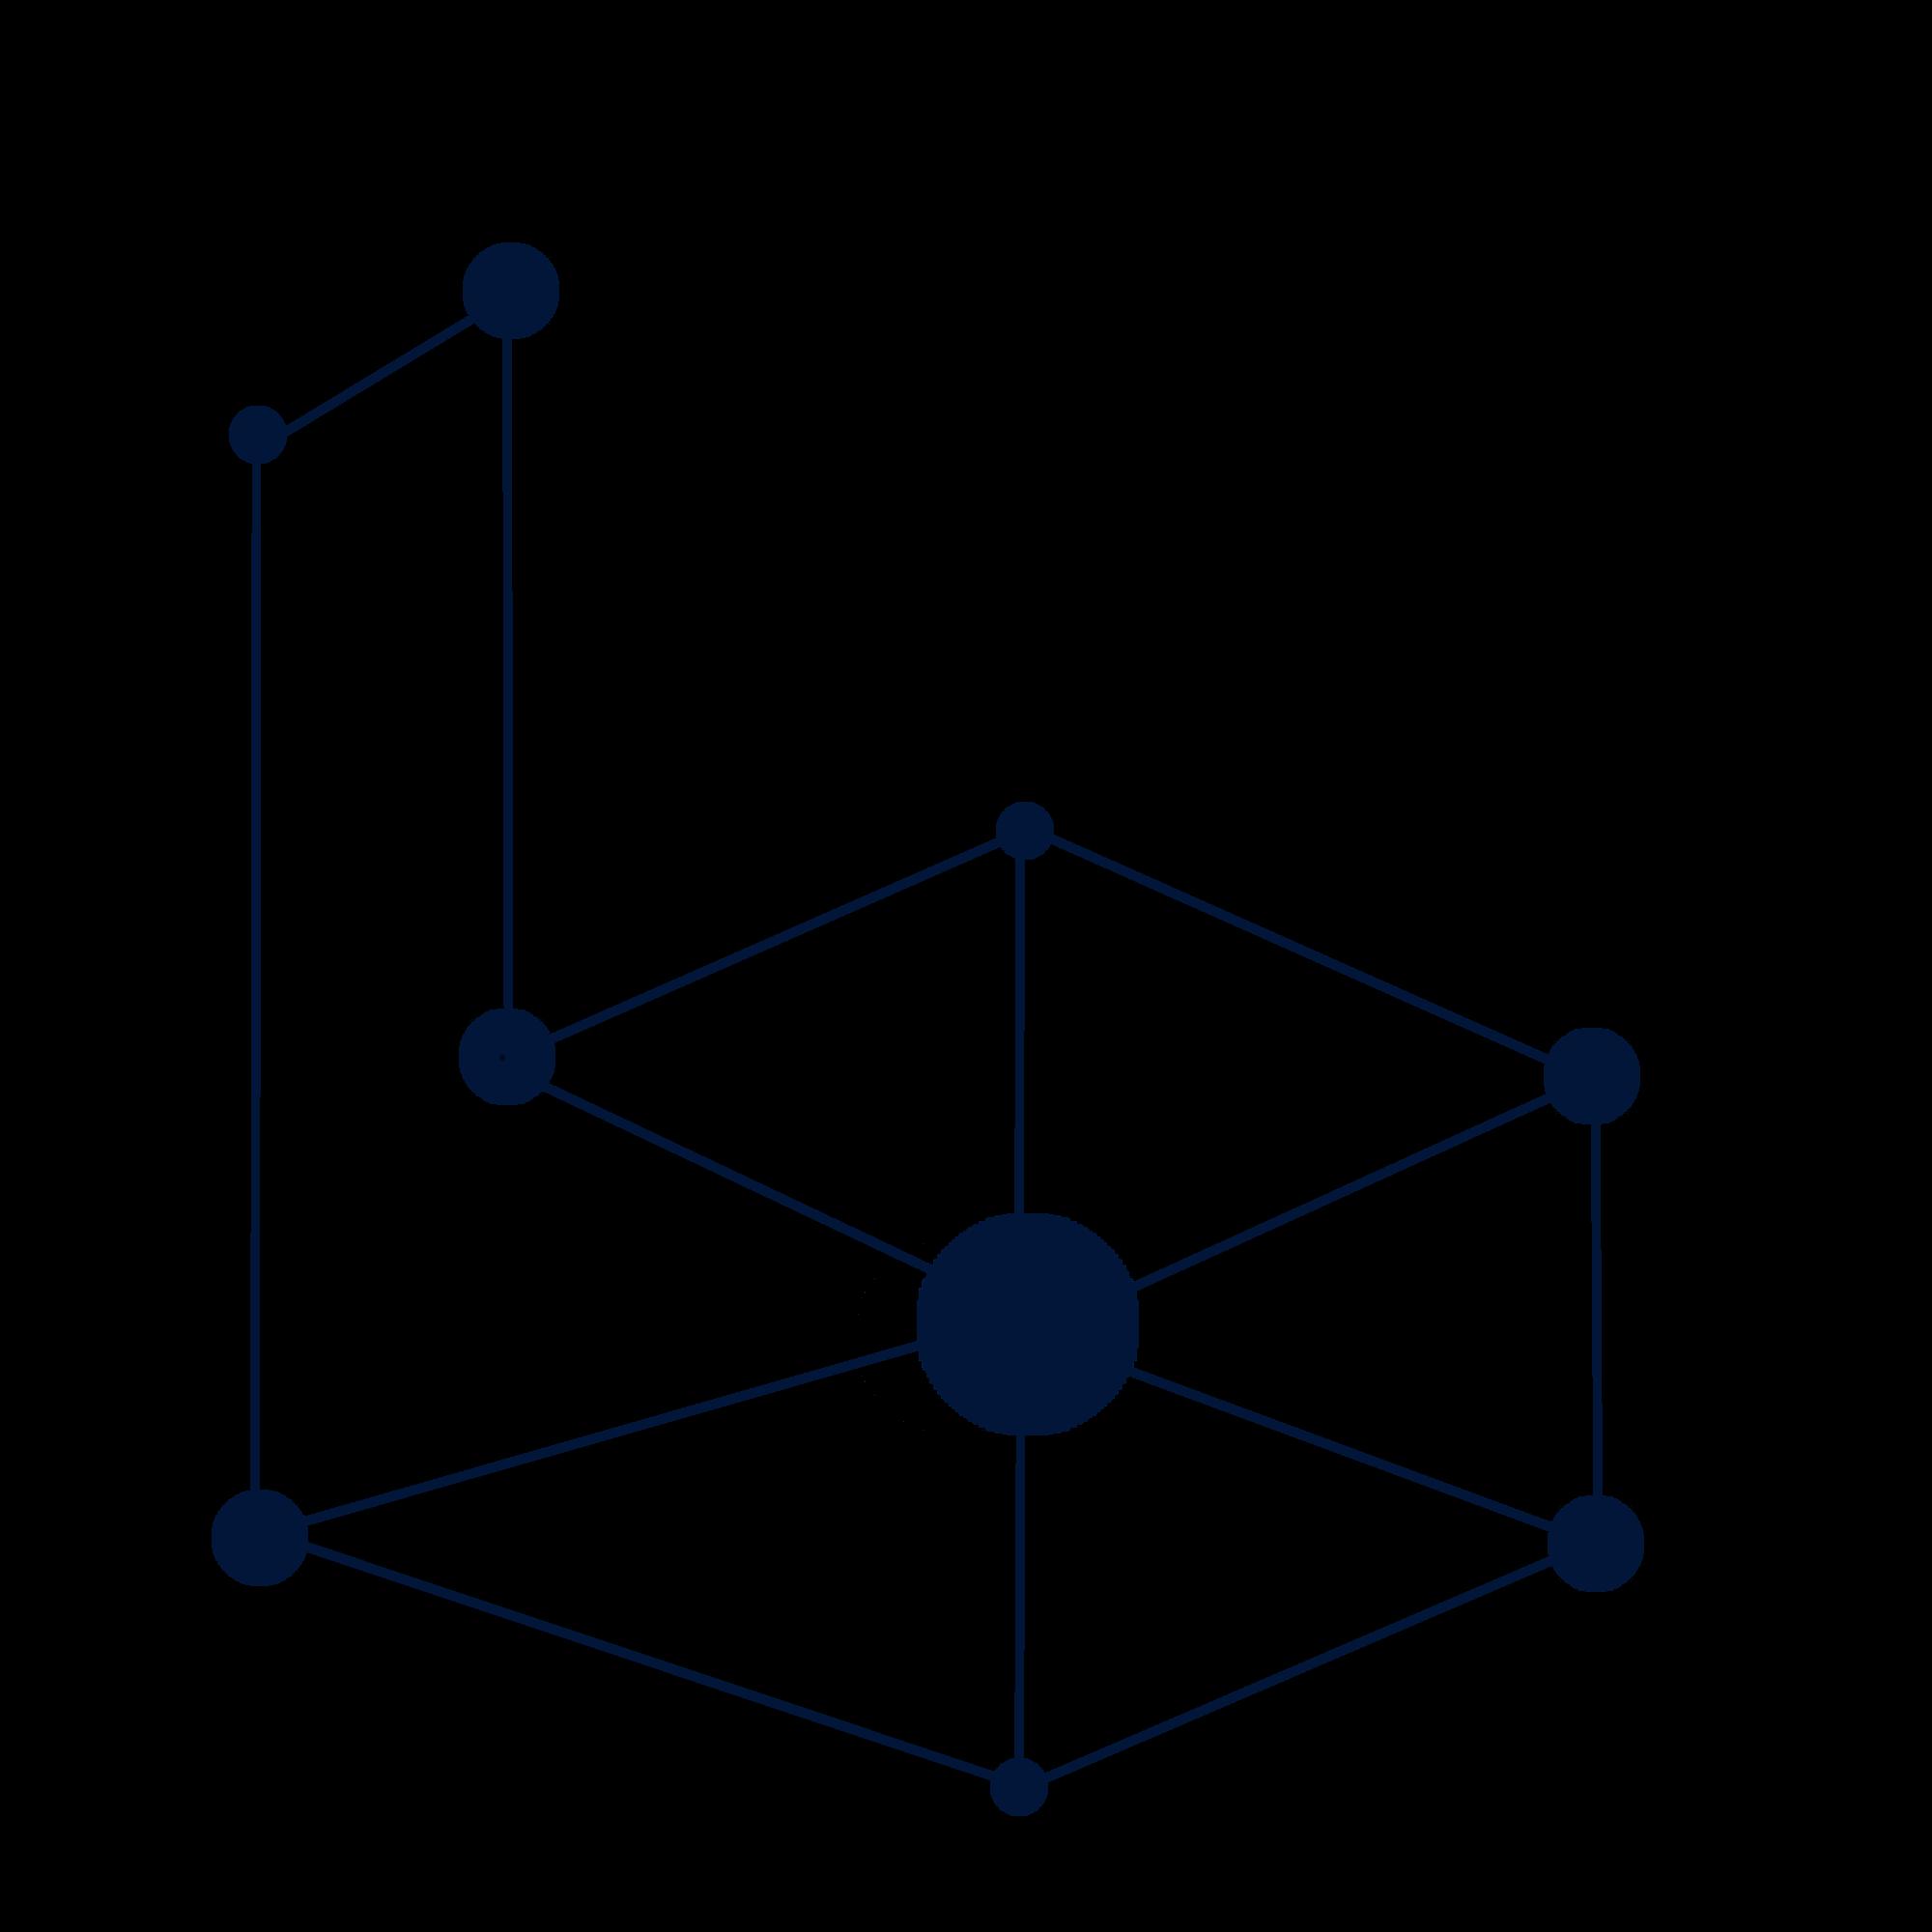 BLOCKCHAINJOBZ logo